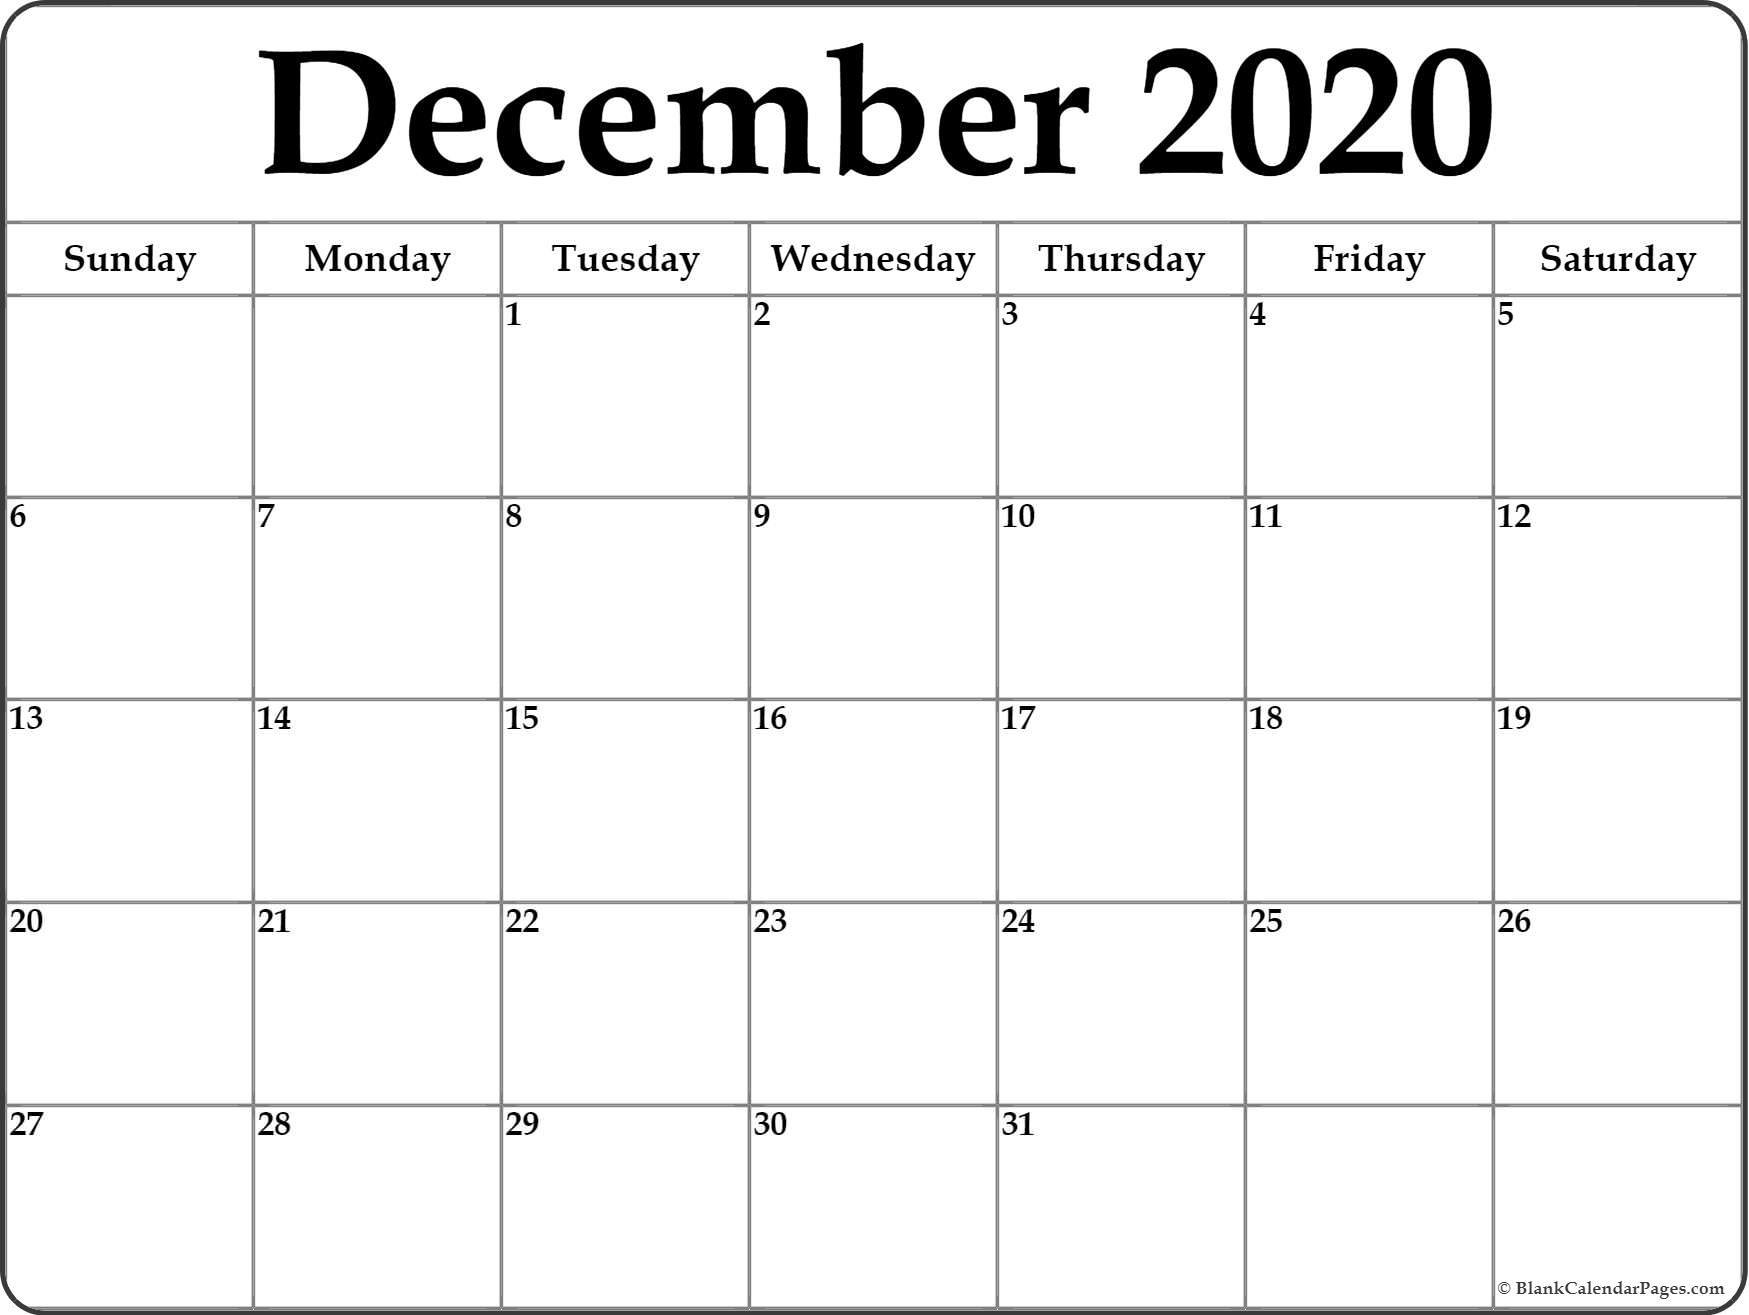 December Monthly Calendar 2020 - Akali  Free 4X6 Printable Calendar 2020